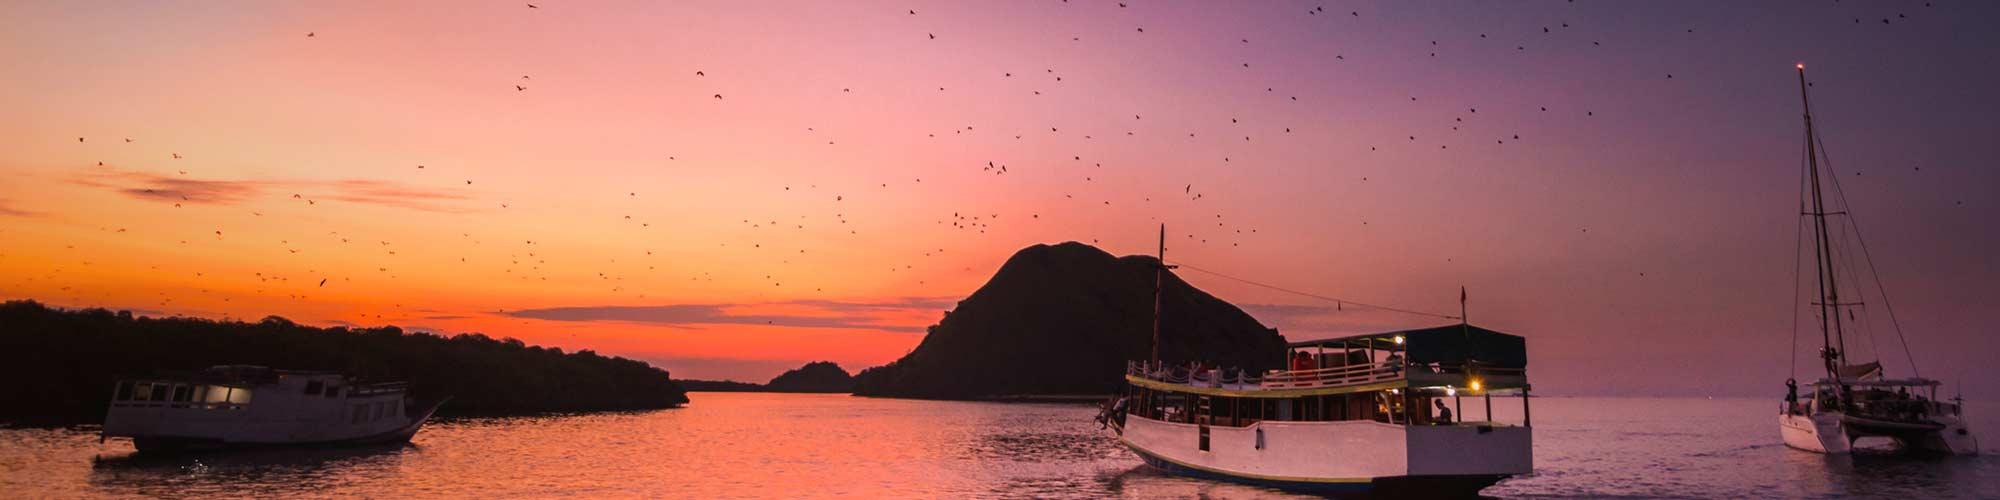 Puesta de sol, isla de Kalong - El Pais Viajes